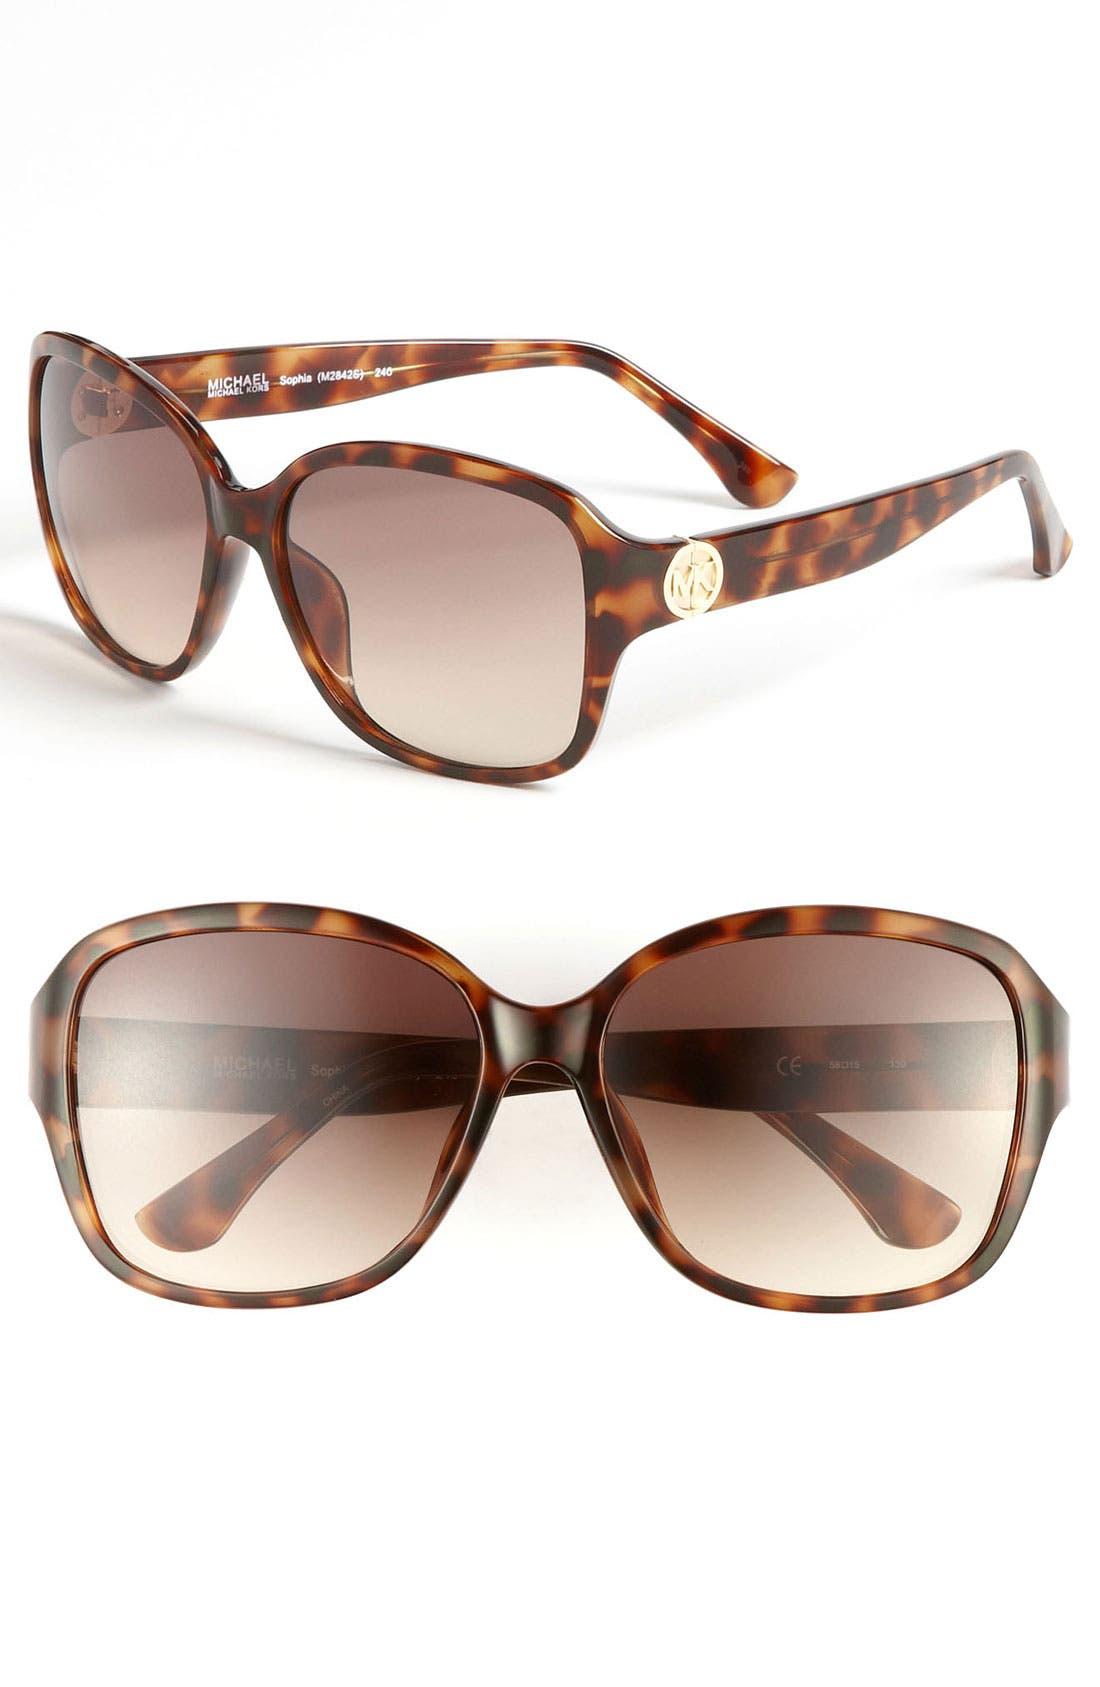 Main Image - MICHAEL Michael Kors 'Sophia' 58mm Sunglasses